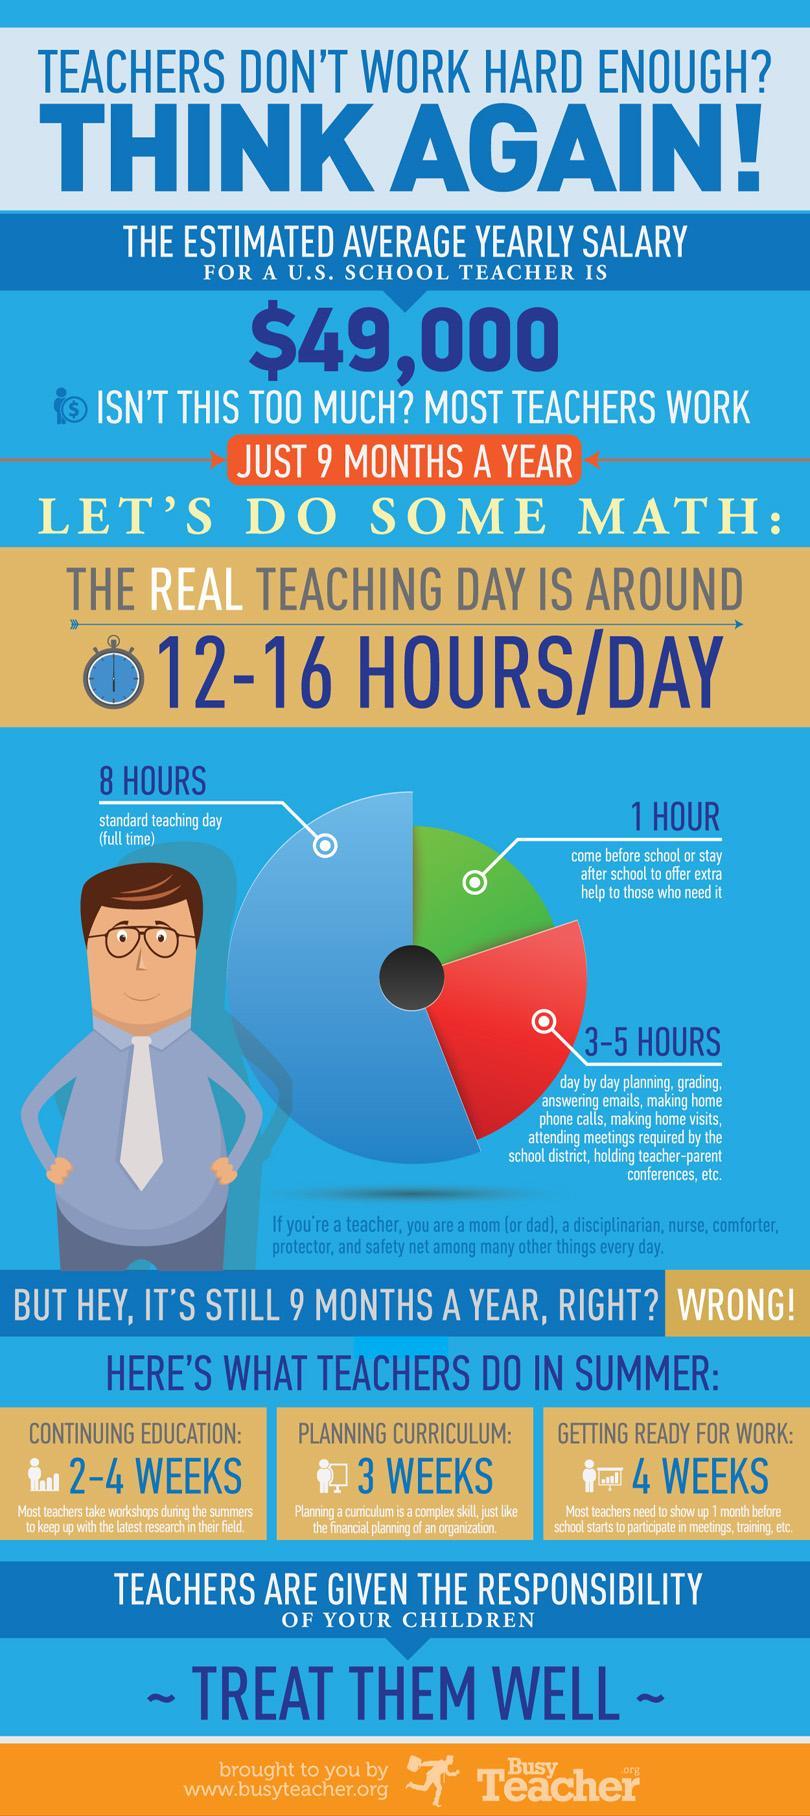 Increasing teacher productivity